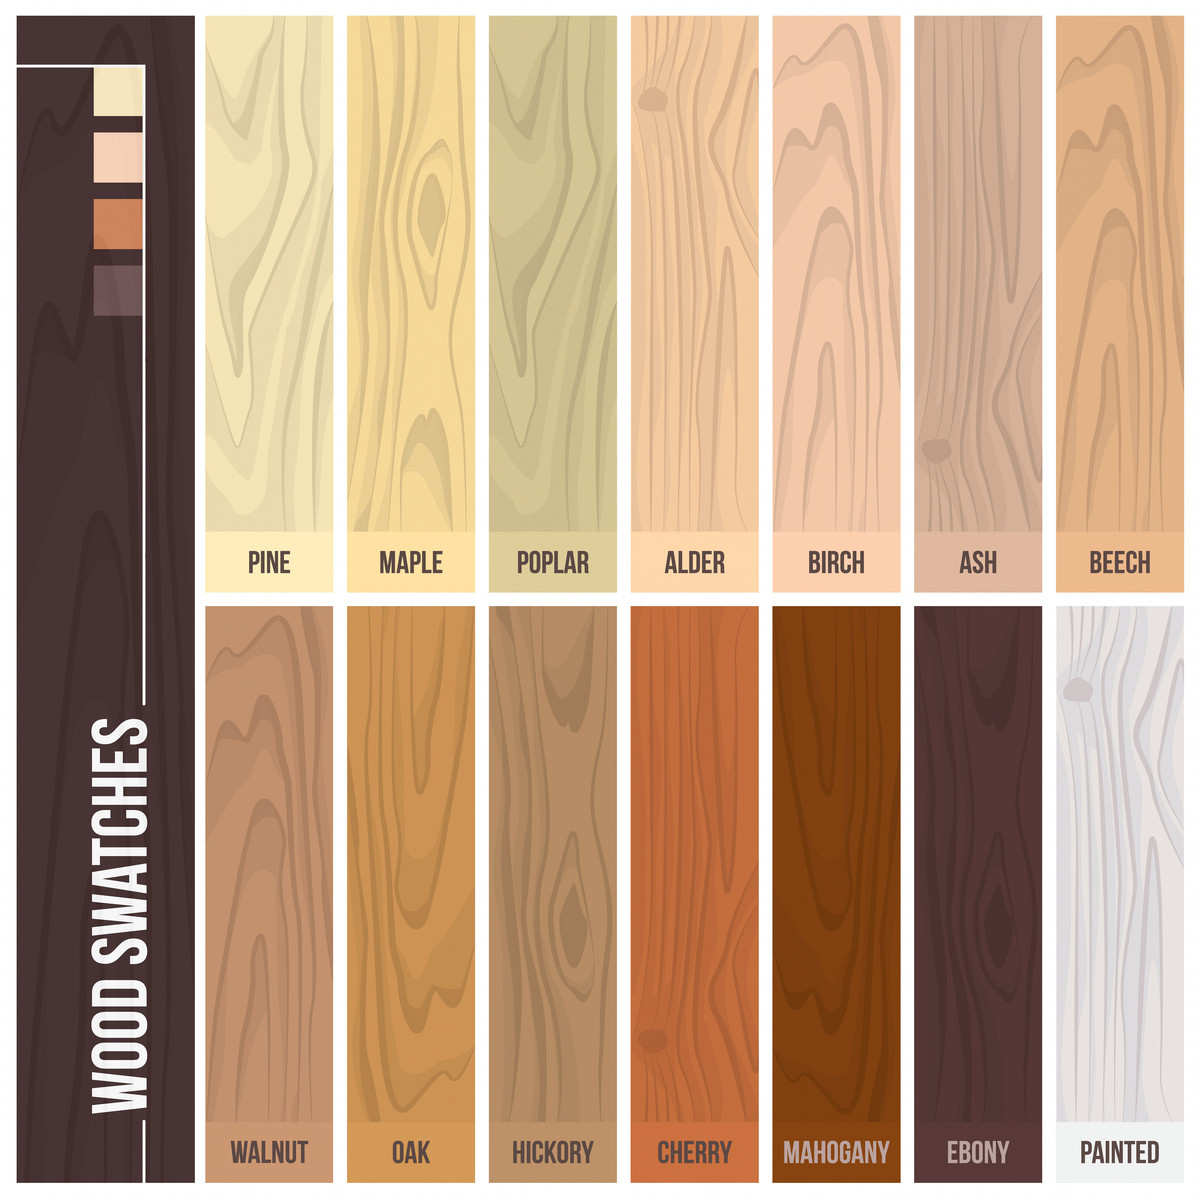 sanding finishing hardwood floors of 12 types of hardwood flooring species styles edging dimensions intended for types of hardwood flooring illustrated guide